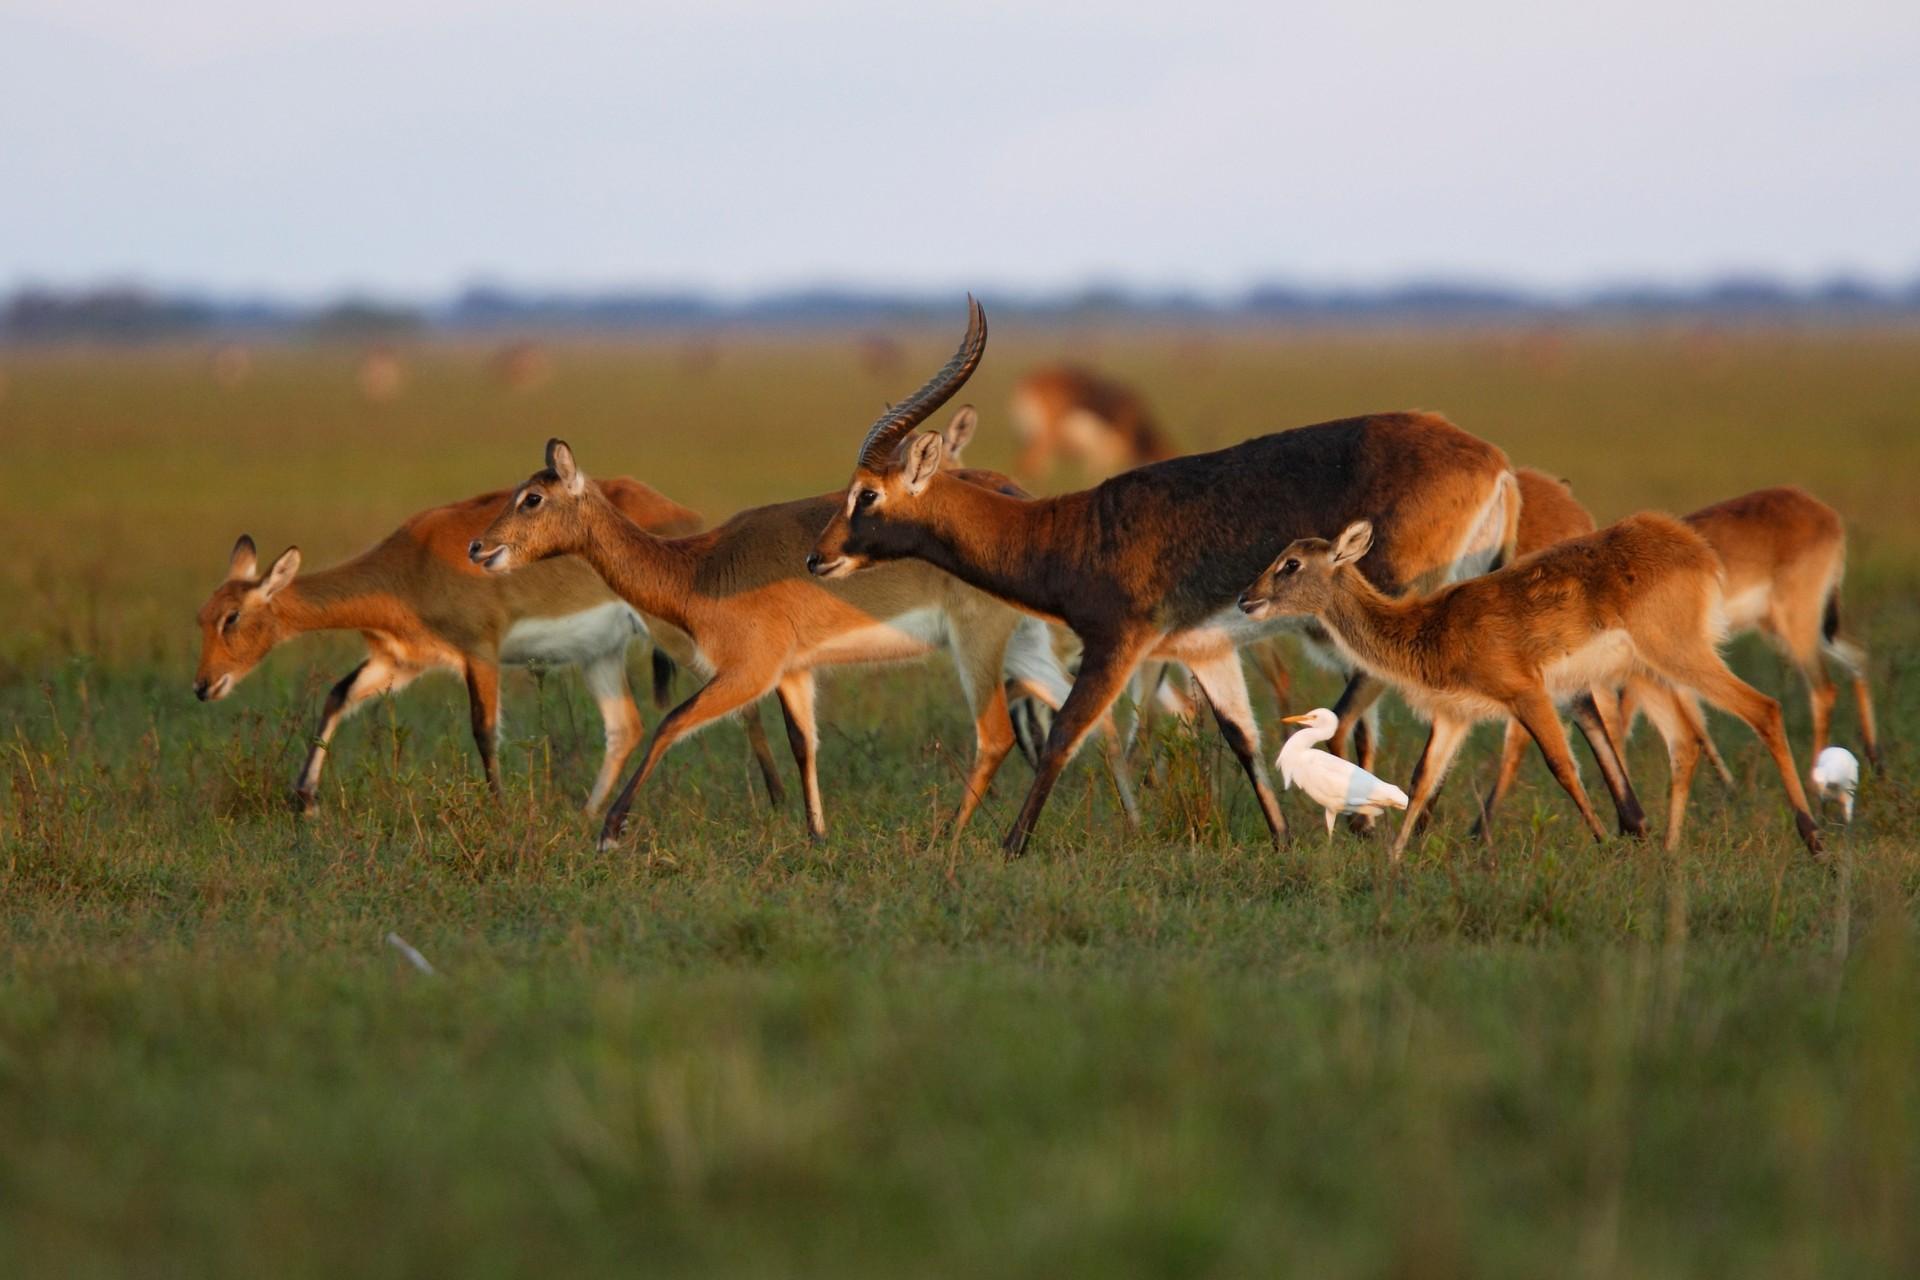 Wildlife of Zambia: Black Lechwe